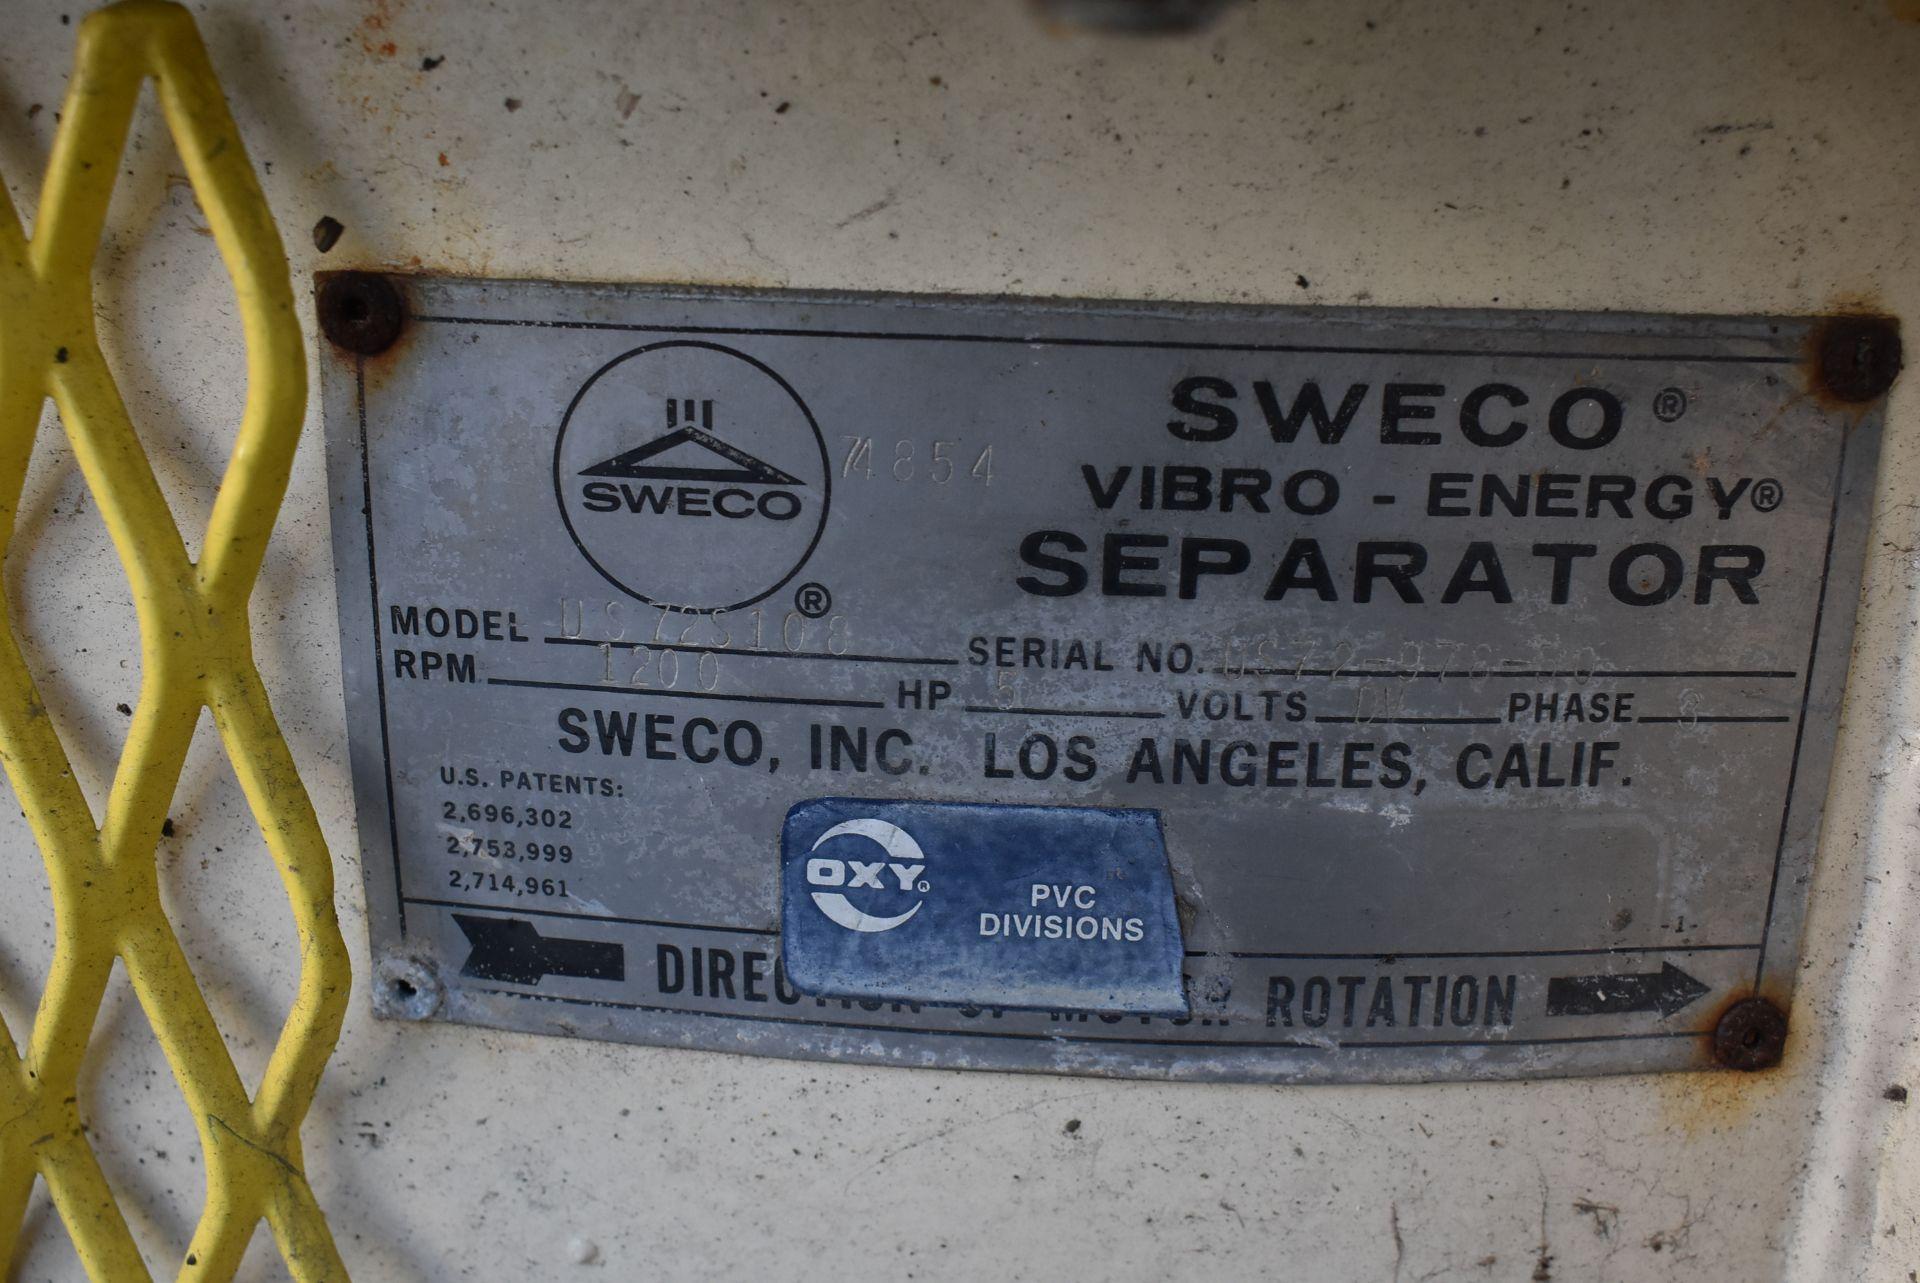 SWECO Model #US72S108 Vibratory Separator, SN 978-50 - Image 2 of 3